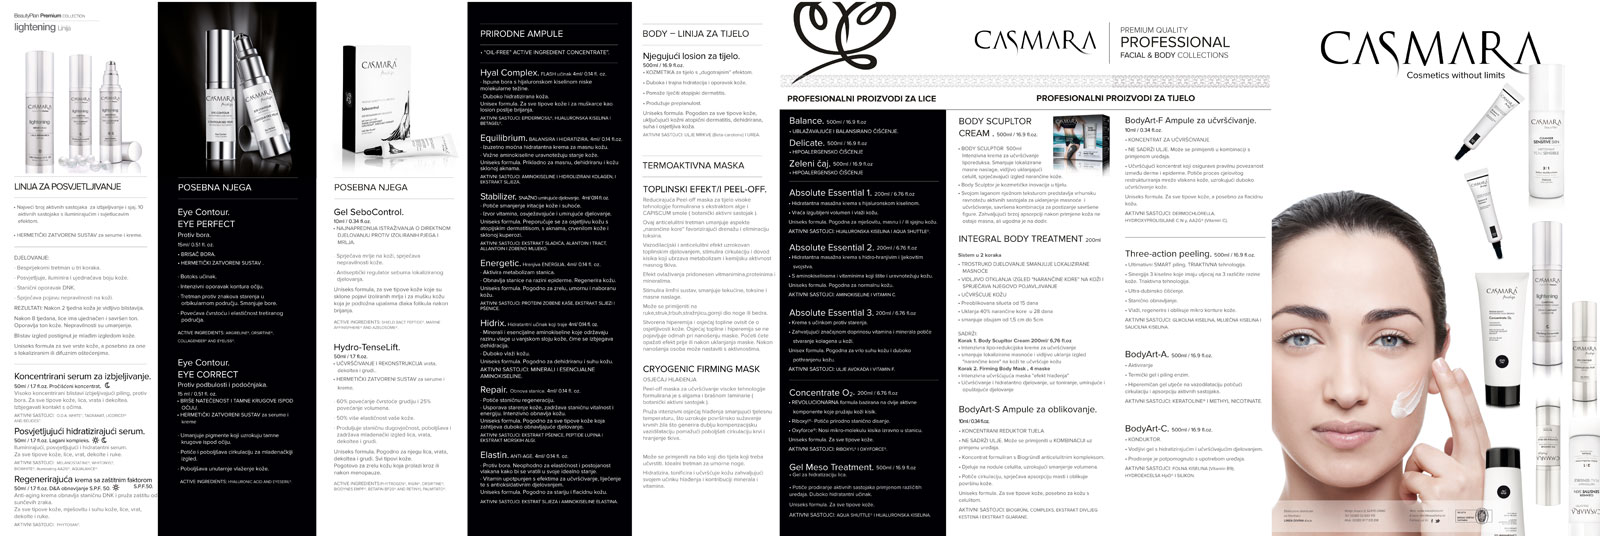 Casmara-brochure